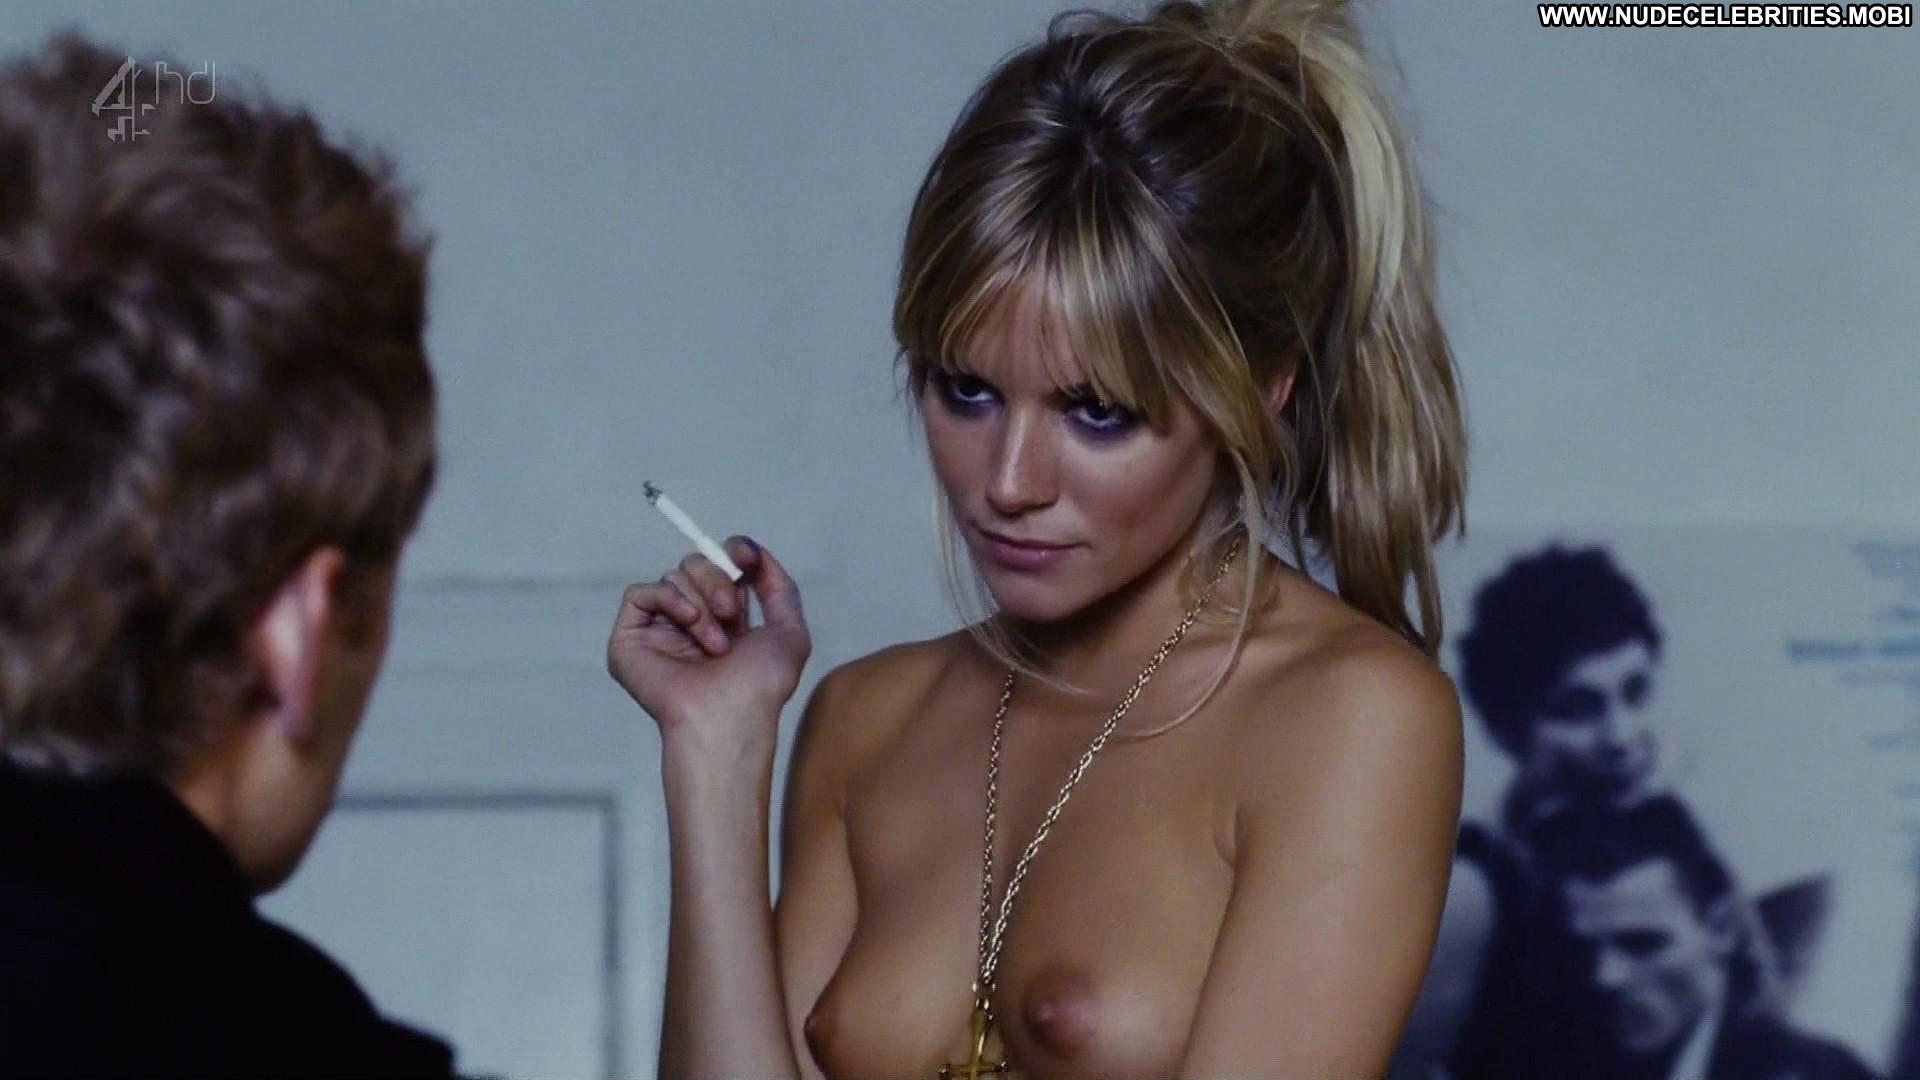 Sienna Miller Jane Krakowski Alfie Alfie Celebrity Panties Movie Nude Bra Sexy Shy Wild-9540